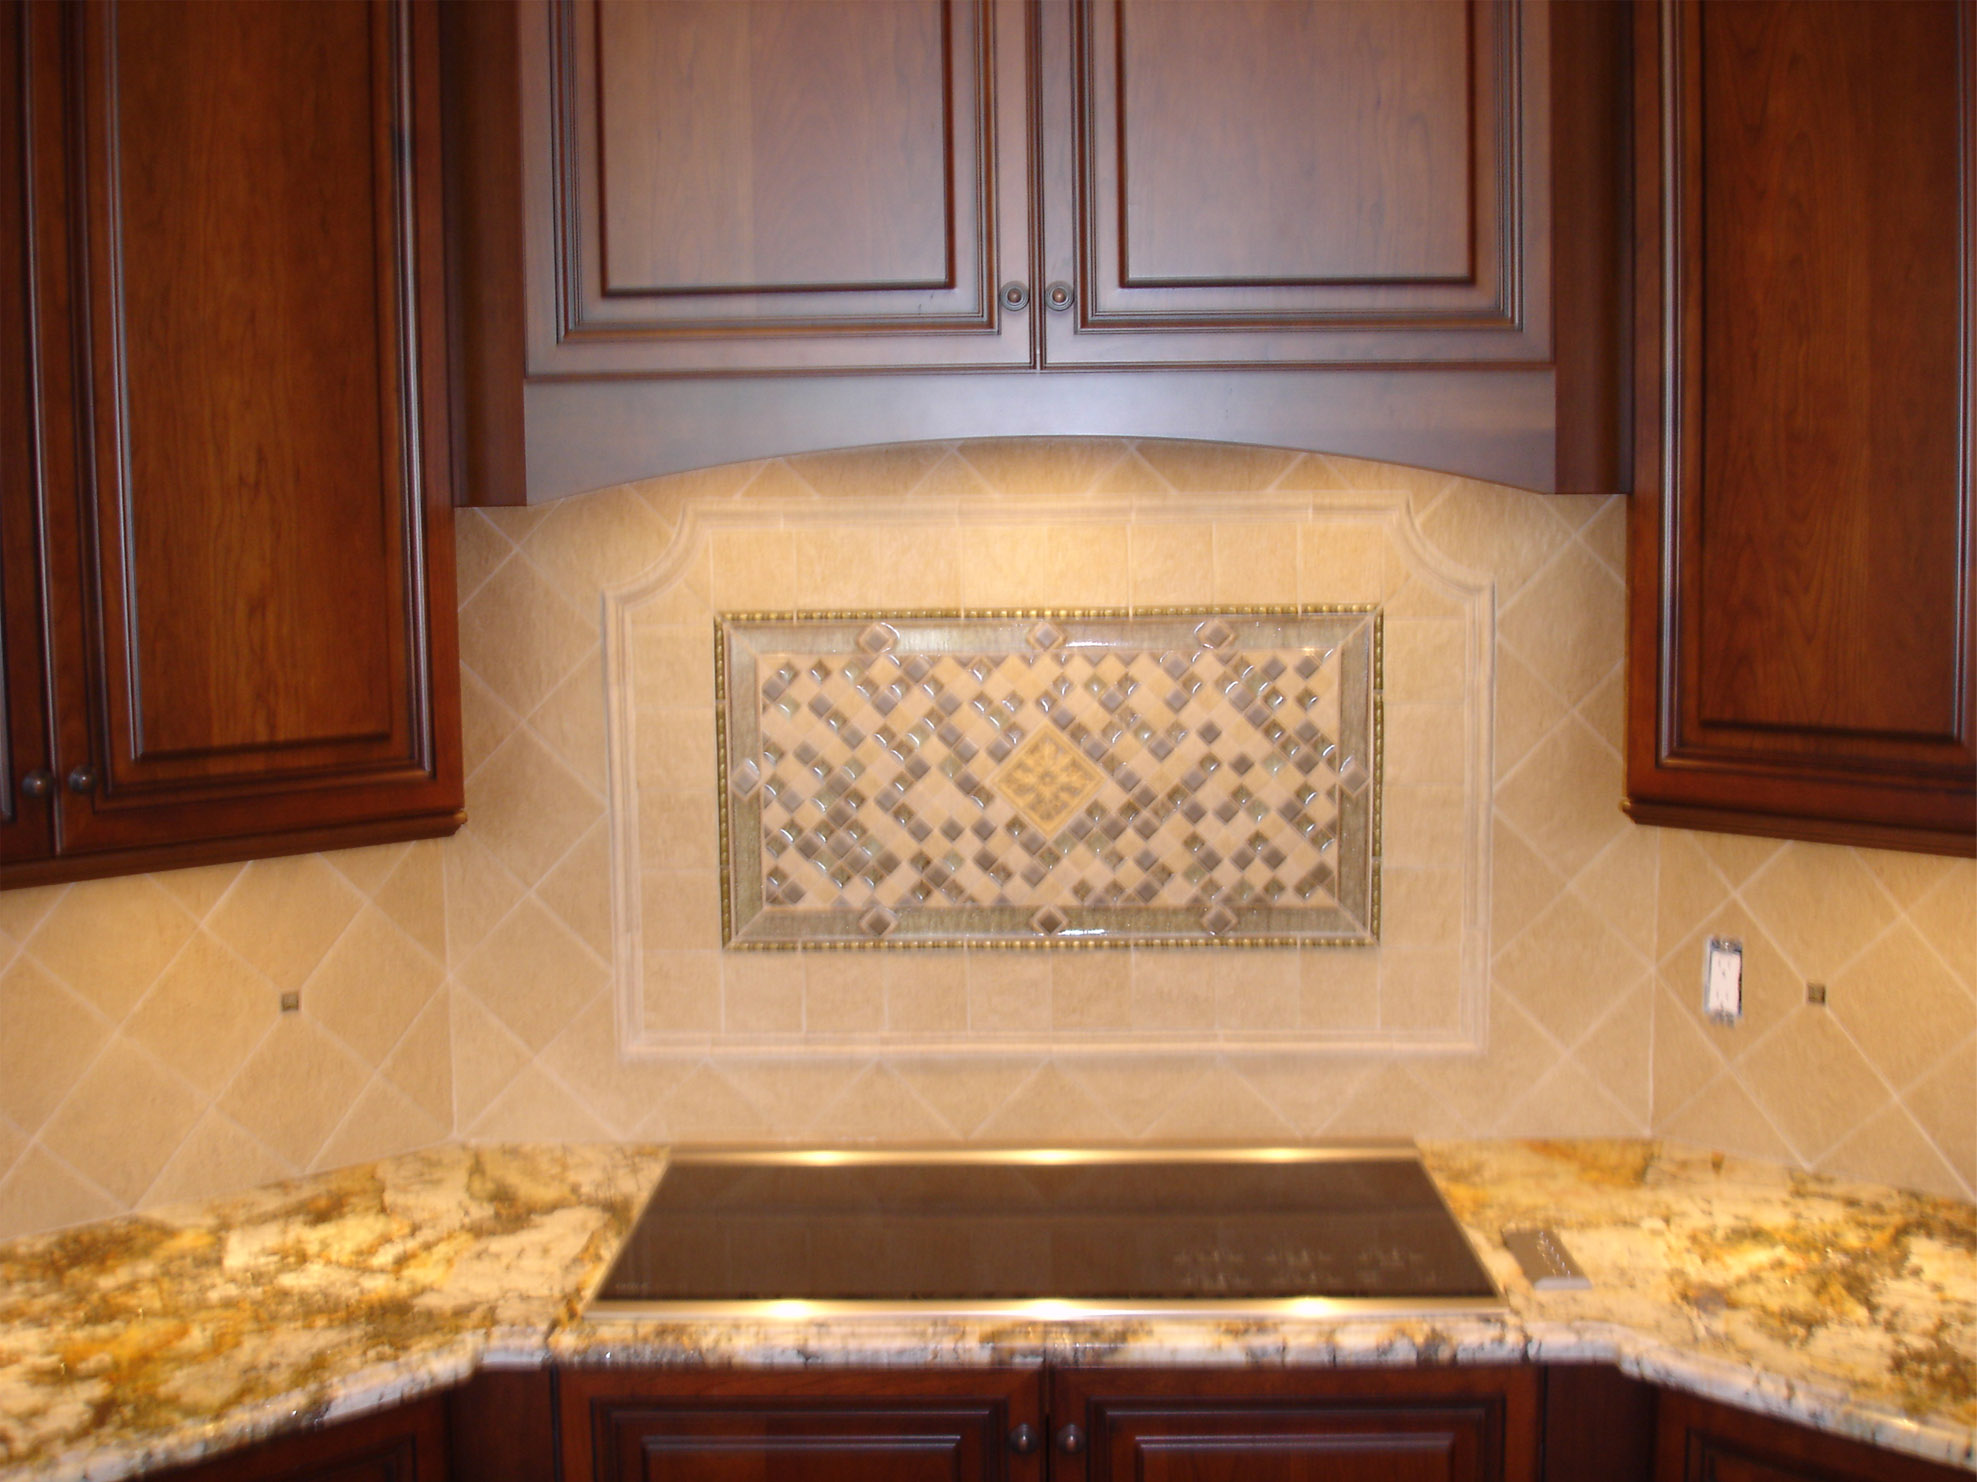 glass kitchen backsplash floor tile